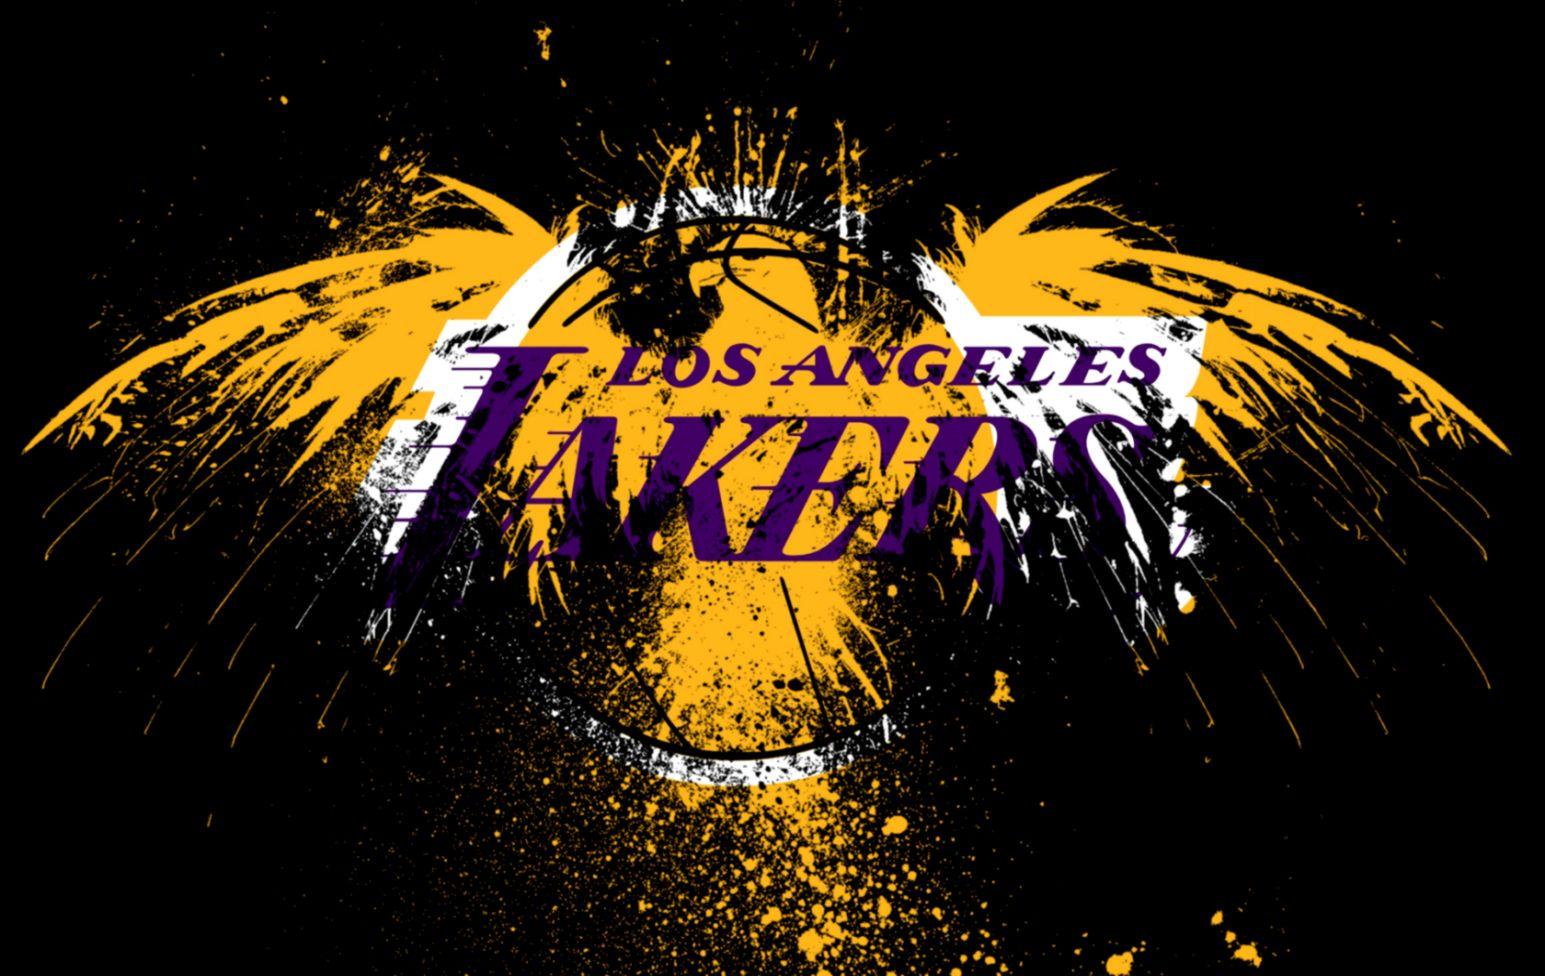 Lakers HD Wallpaper Lakers Desktop Backgrounds New Wallpapers